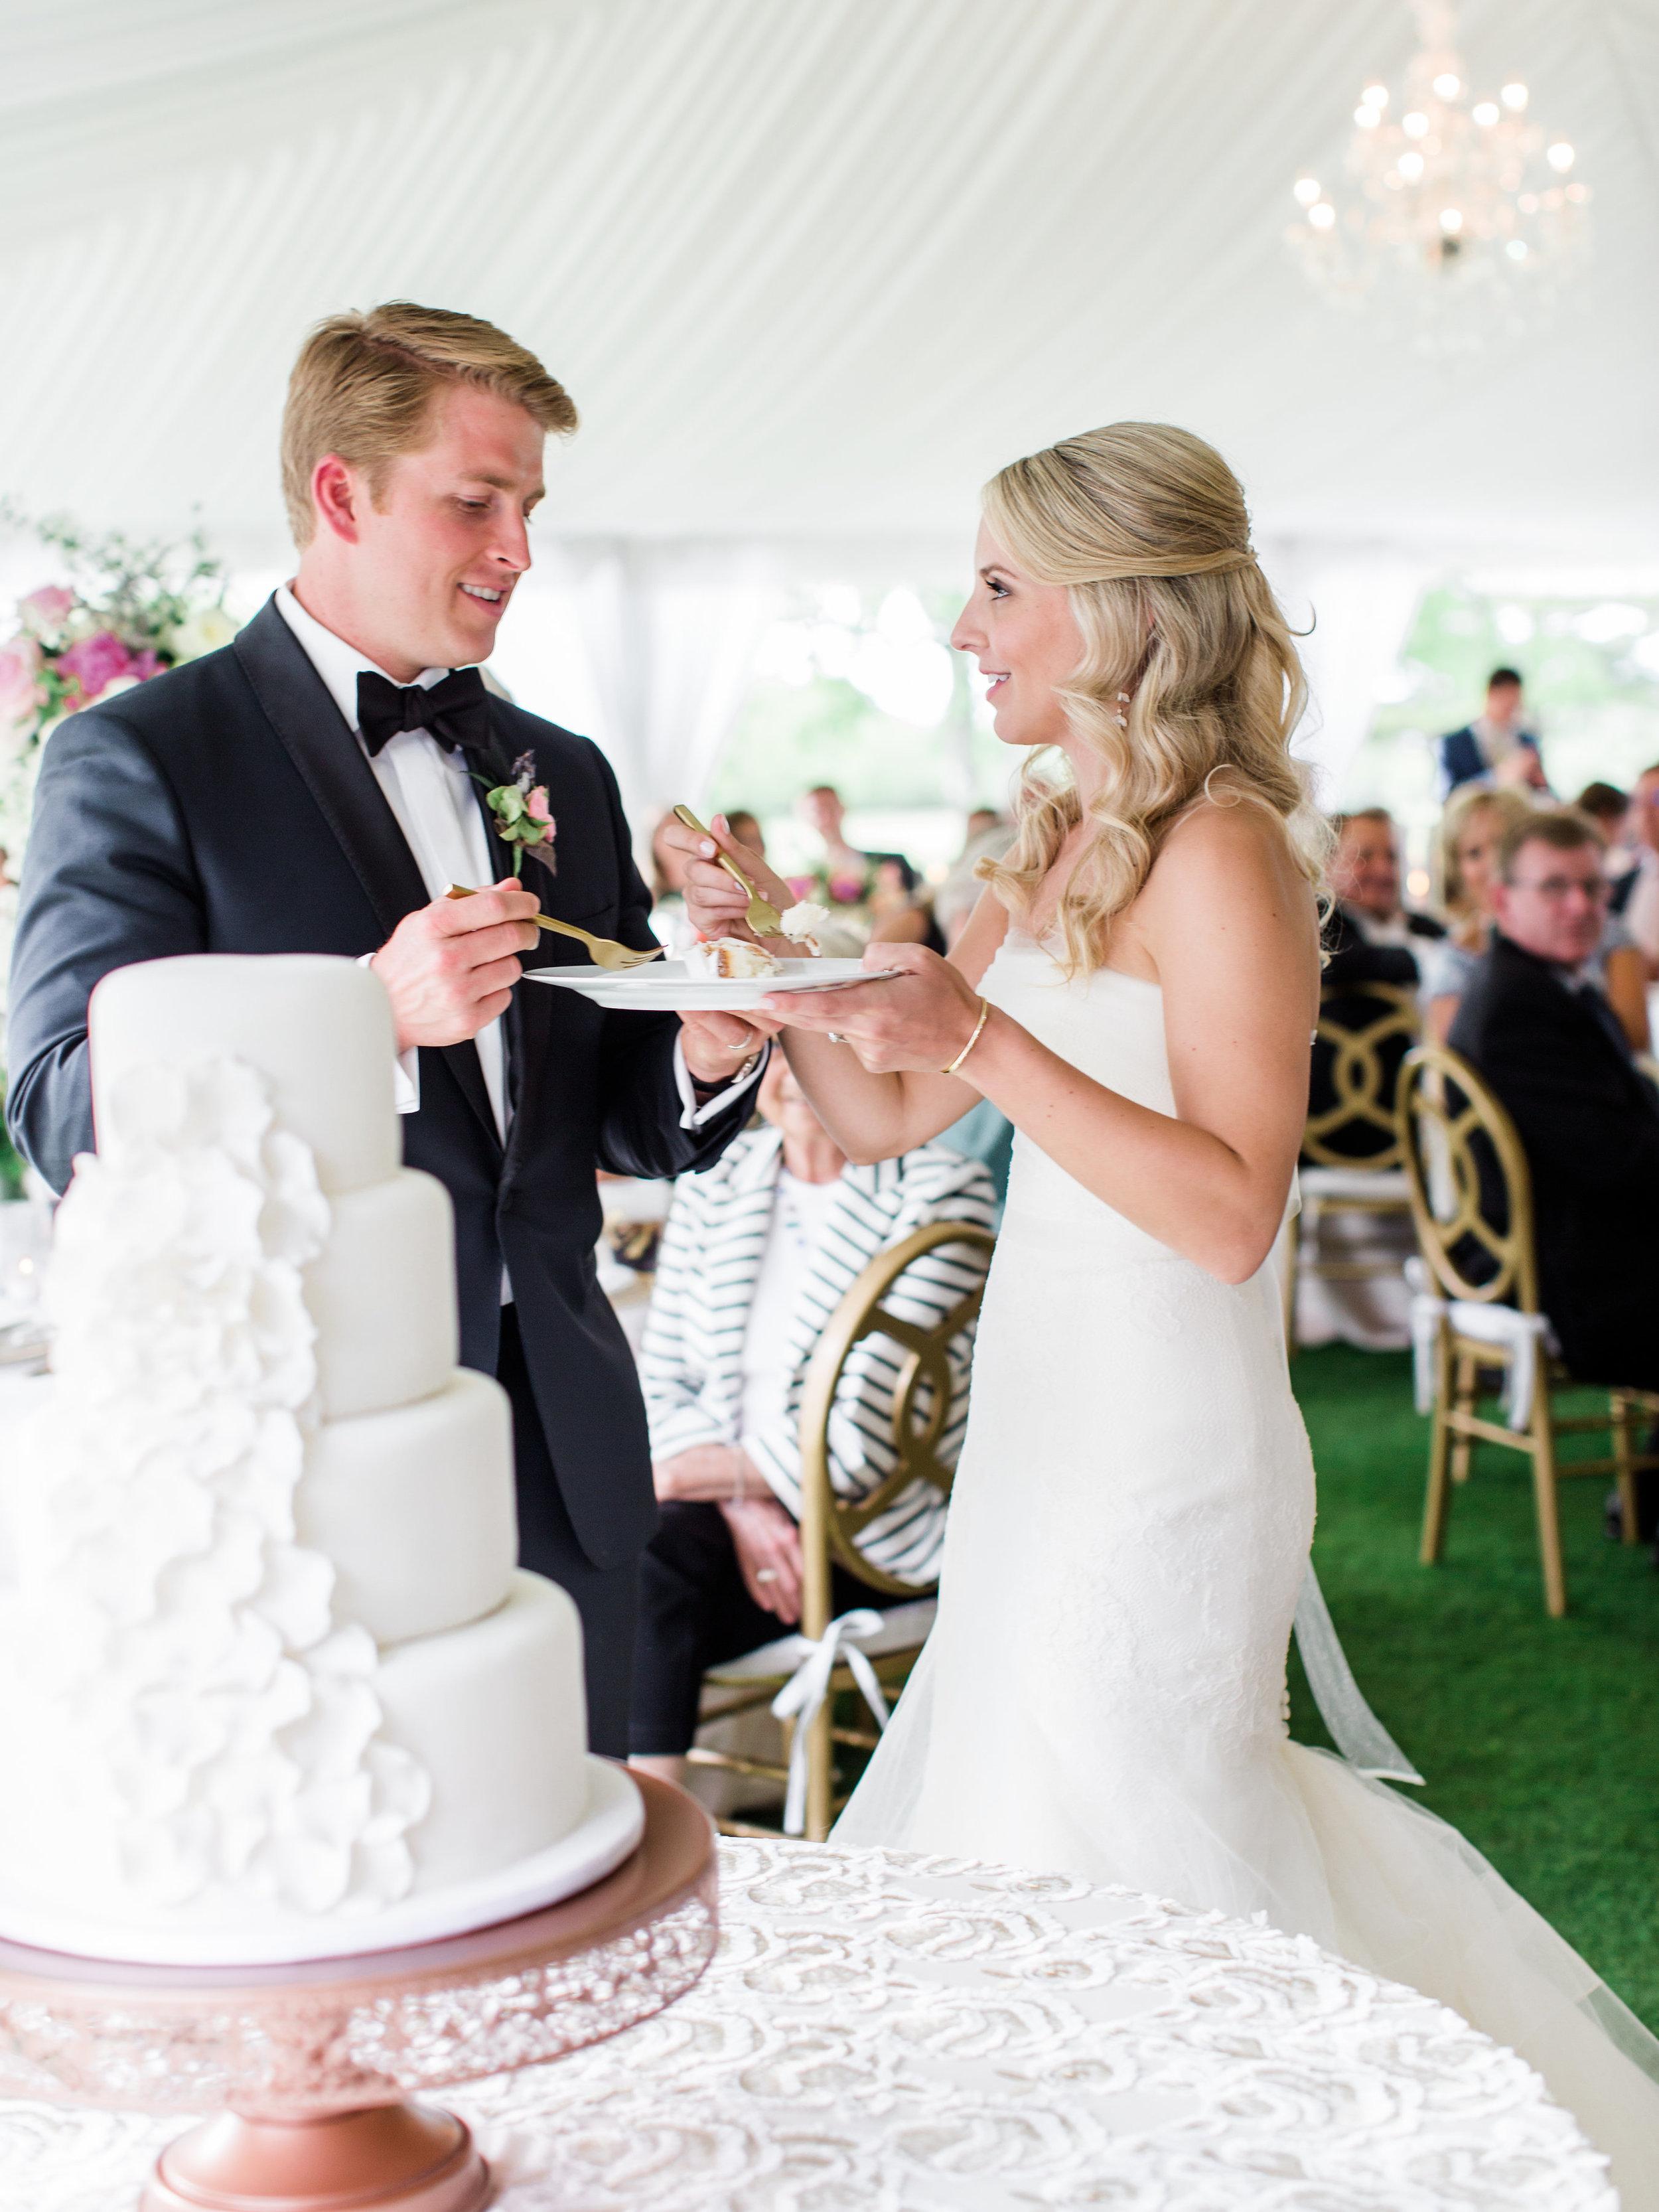 Coffman+Wedding+Reception-14.jpg